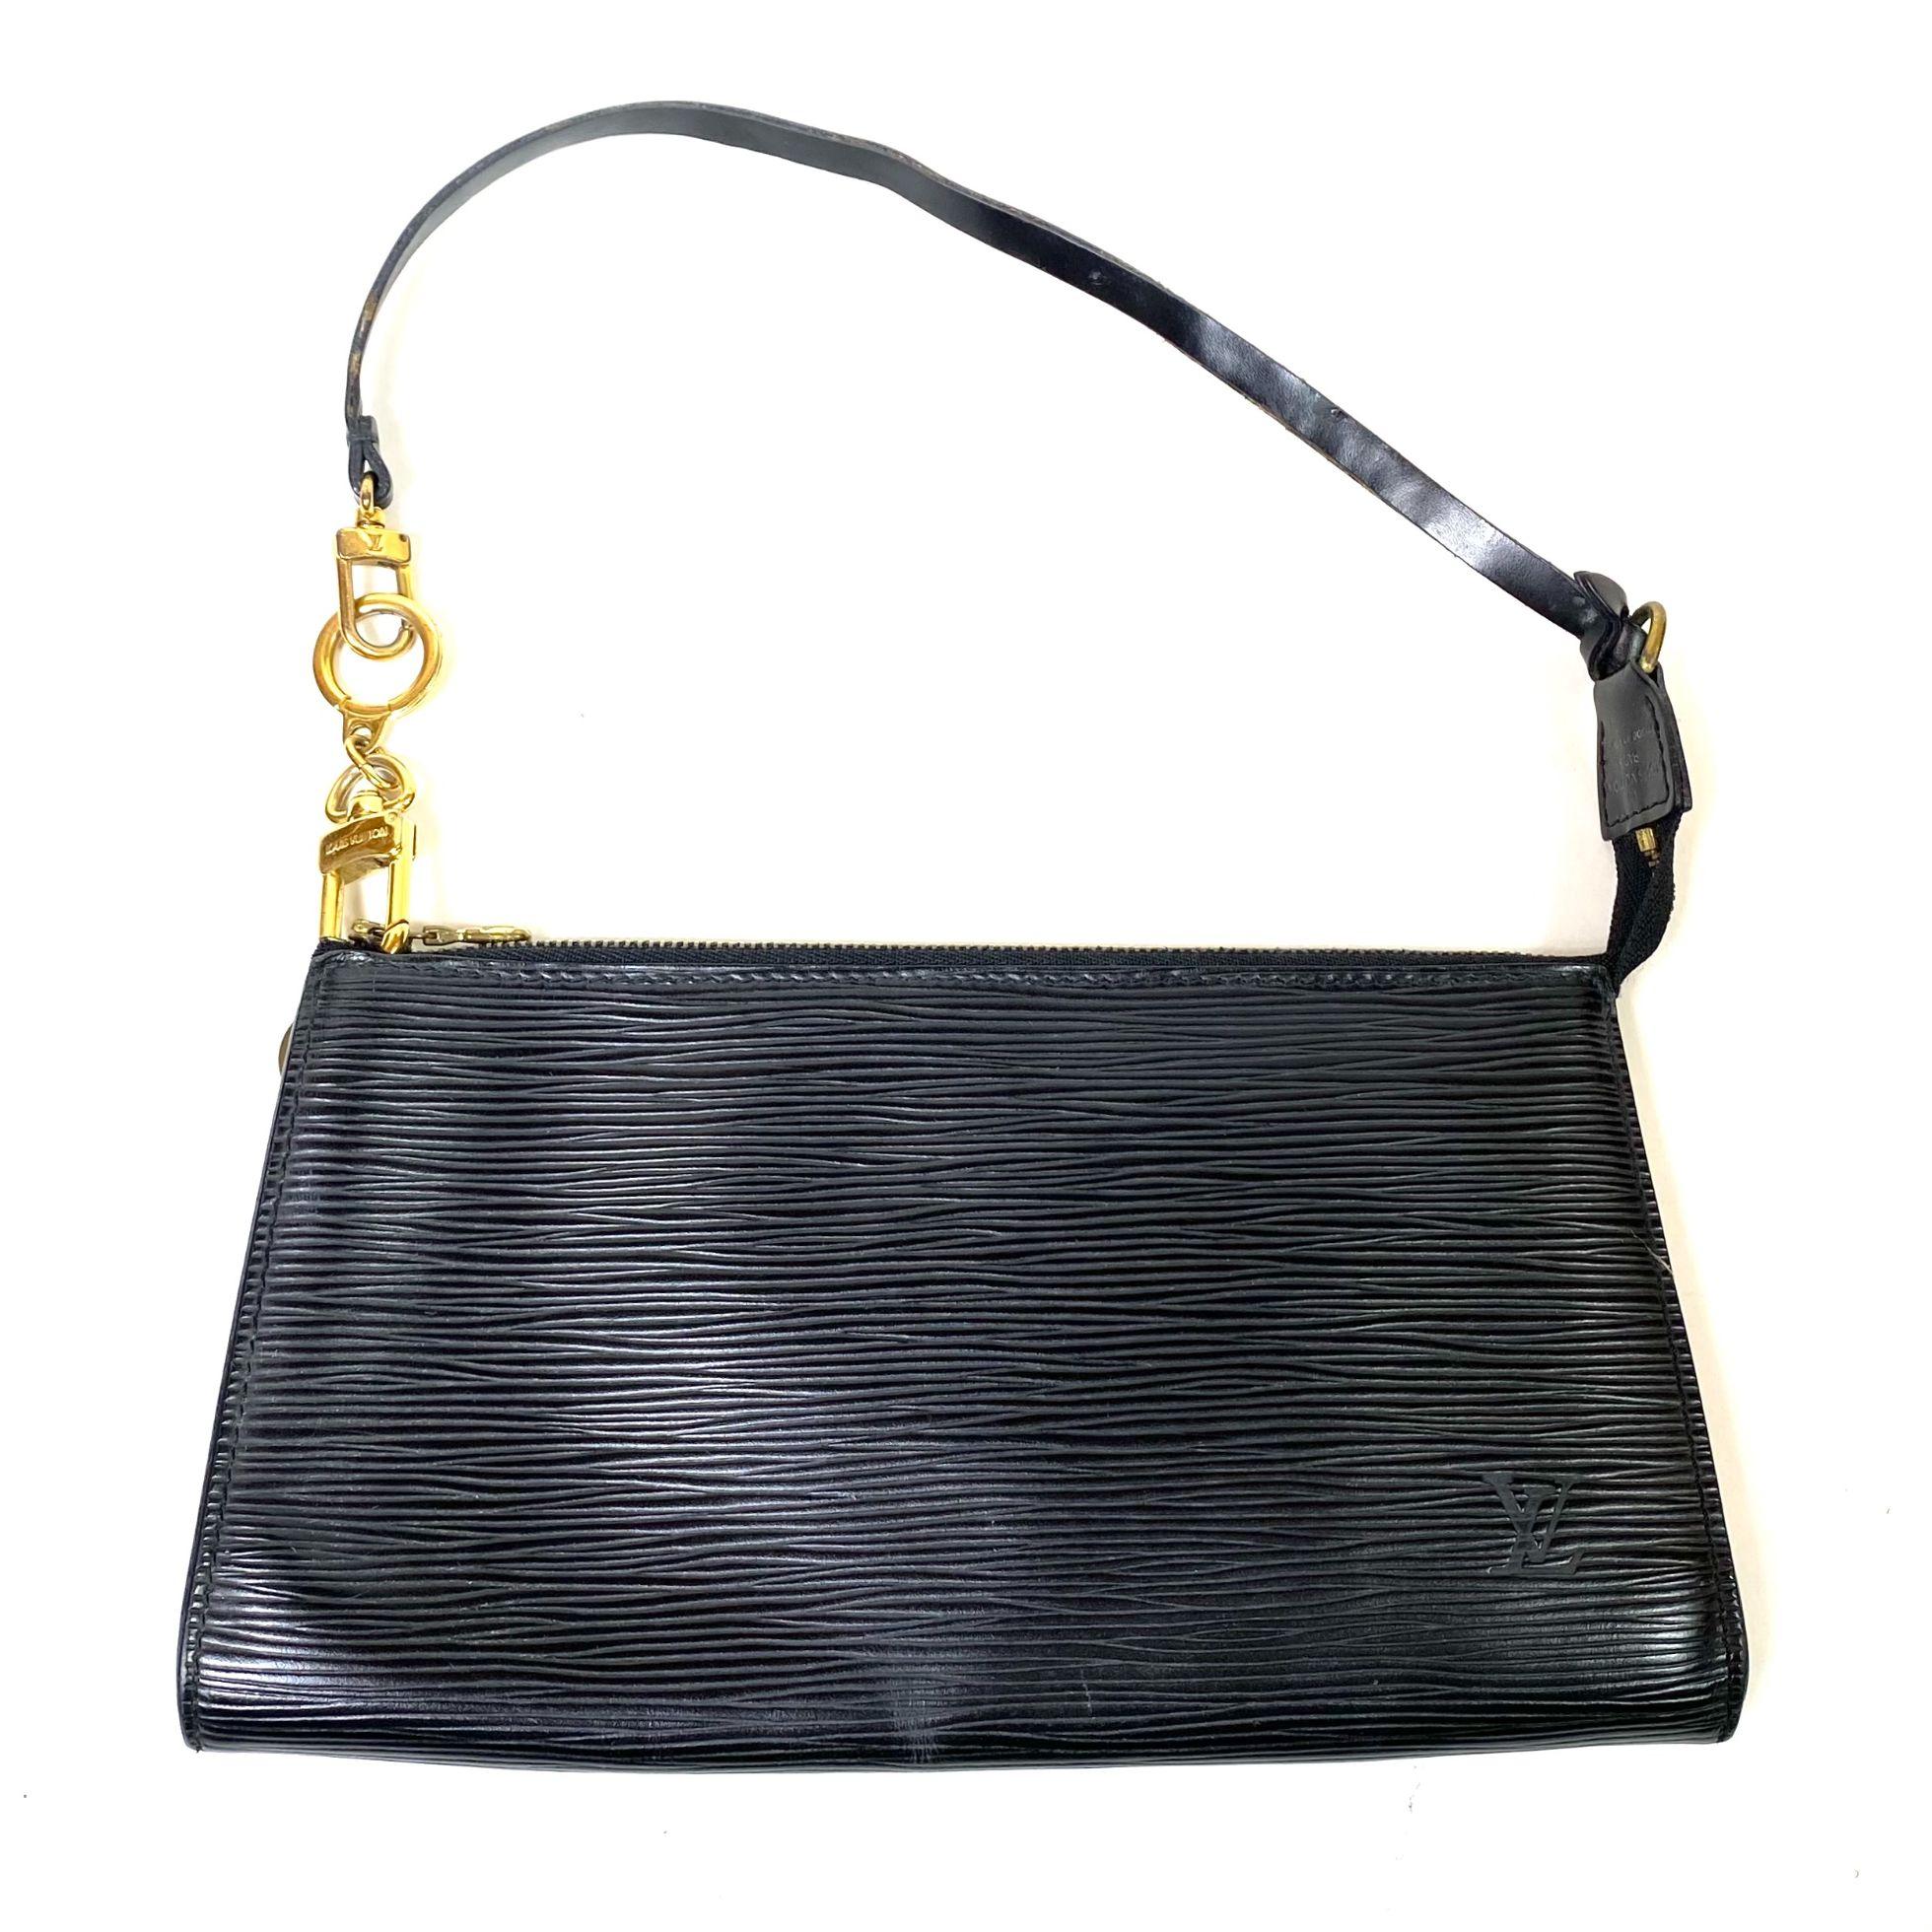 Bolsa Louis Vuitton Pochette Epi Preta